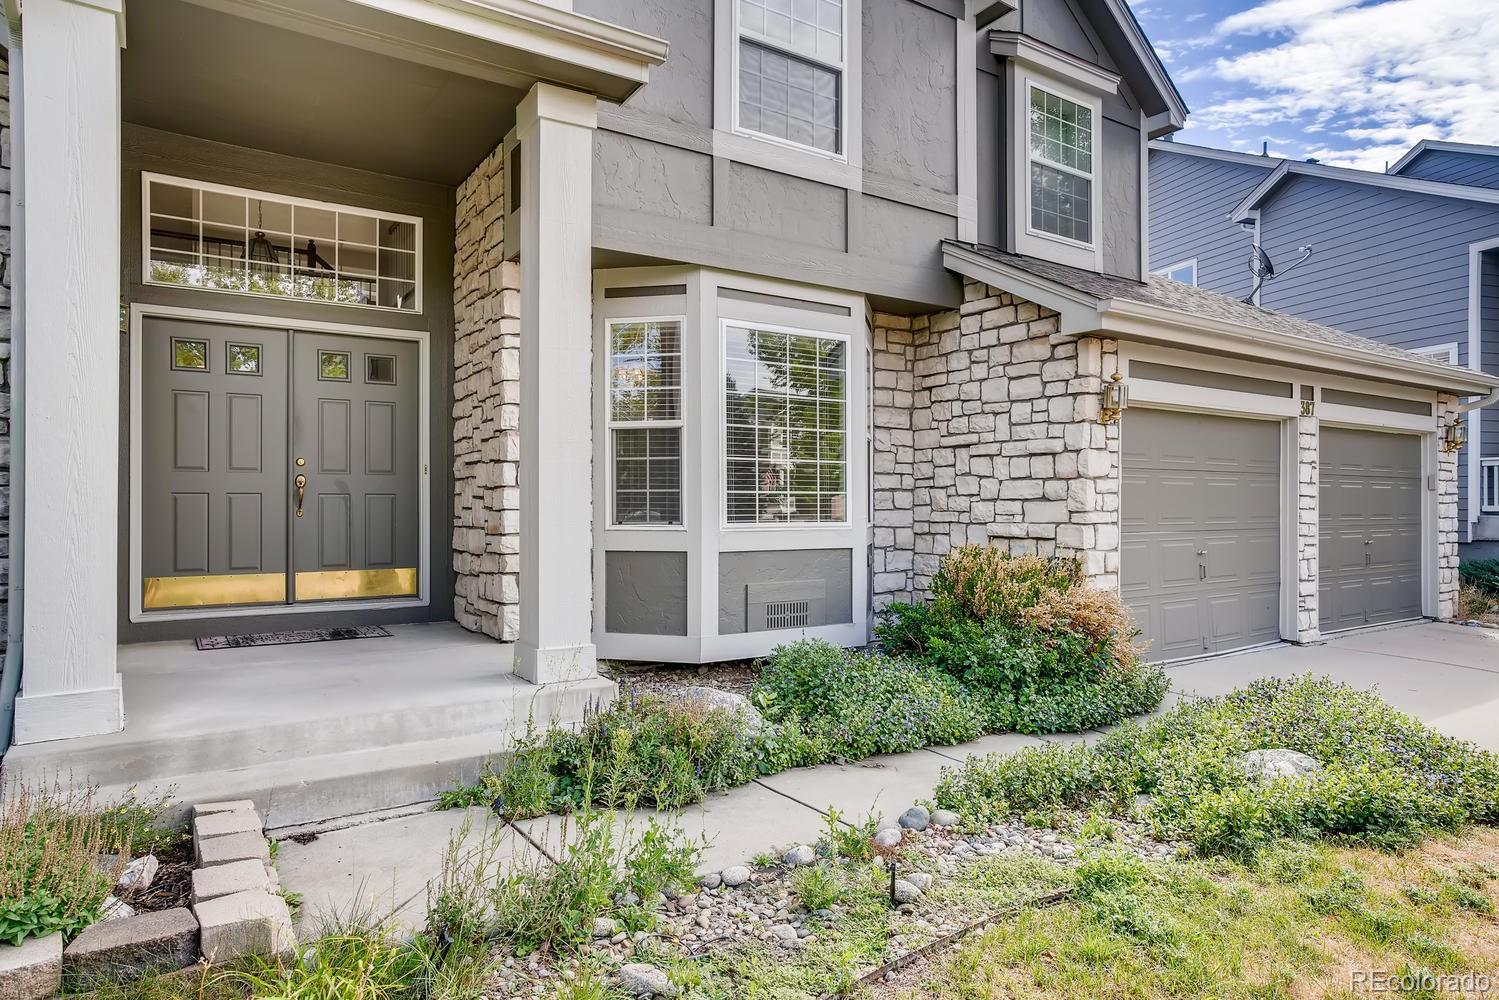 MLS# 5985663 - 2 - 387 Winterthur Way, Highlands Ranch, CO 80129